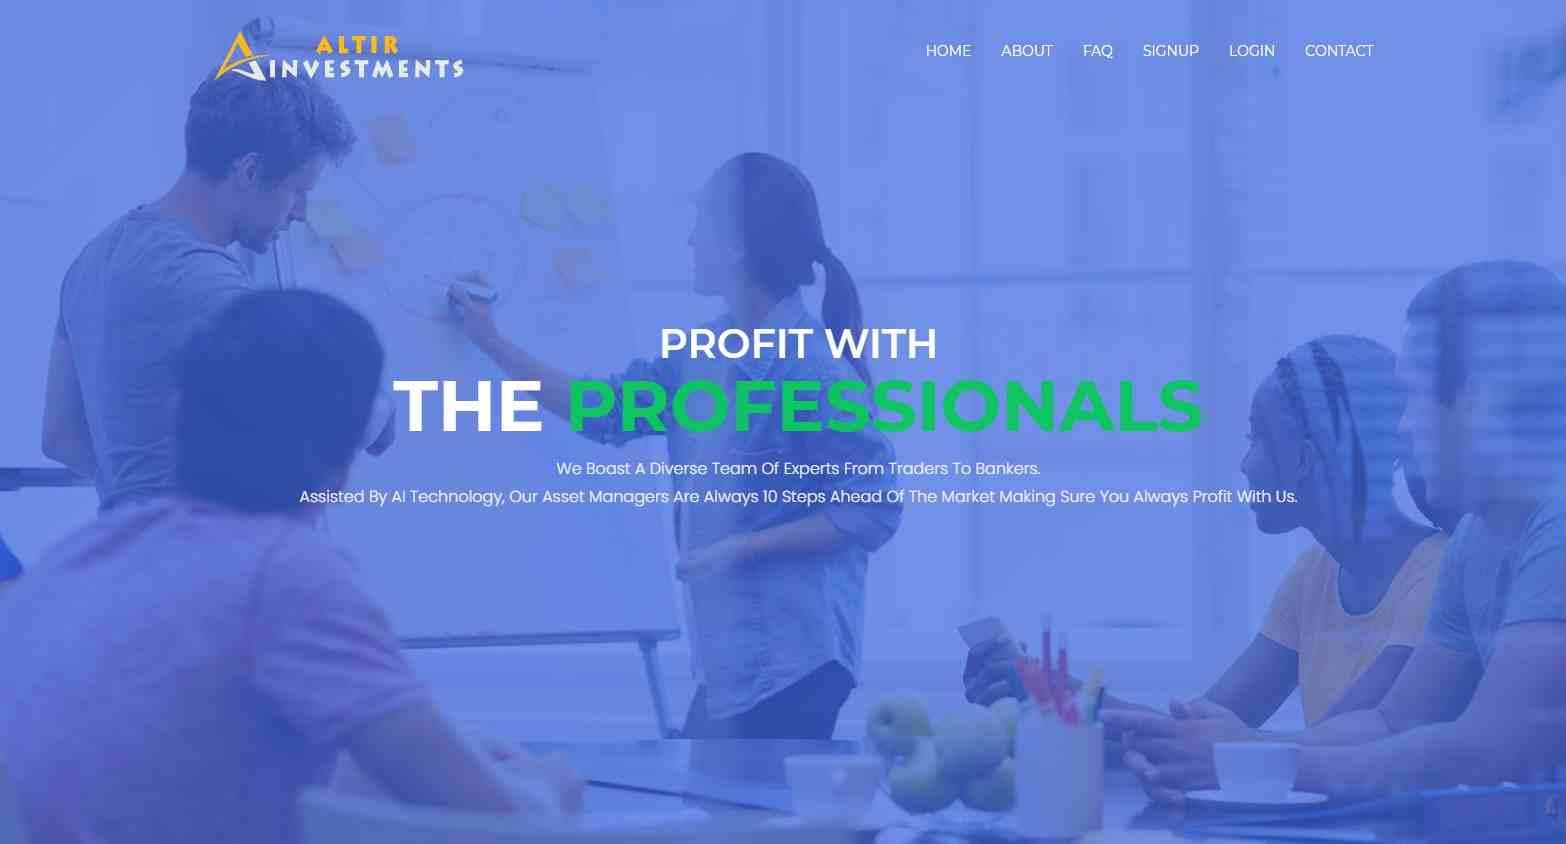 Altir Investment Group